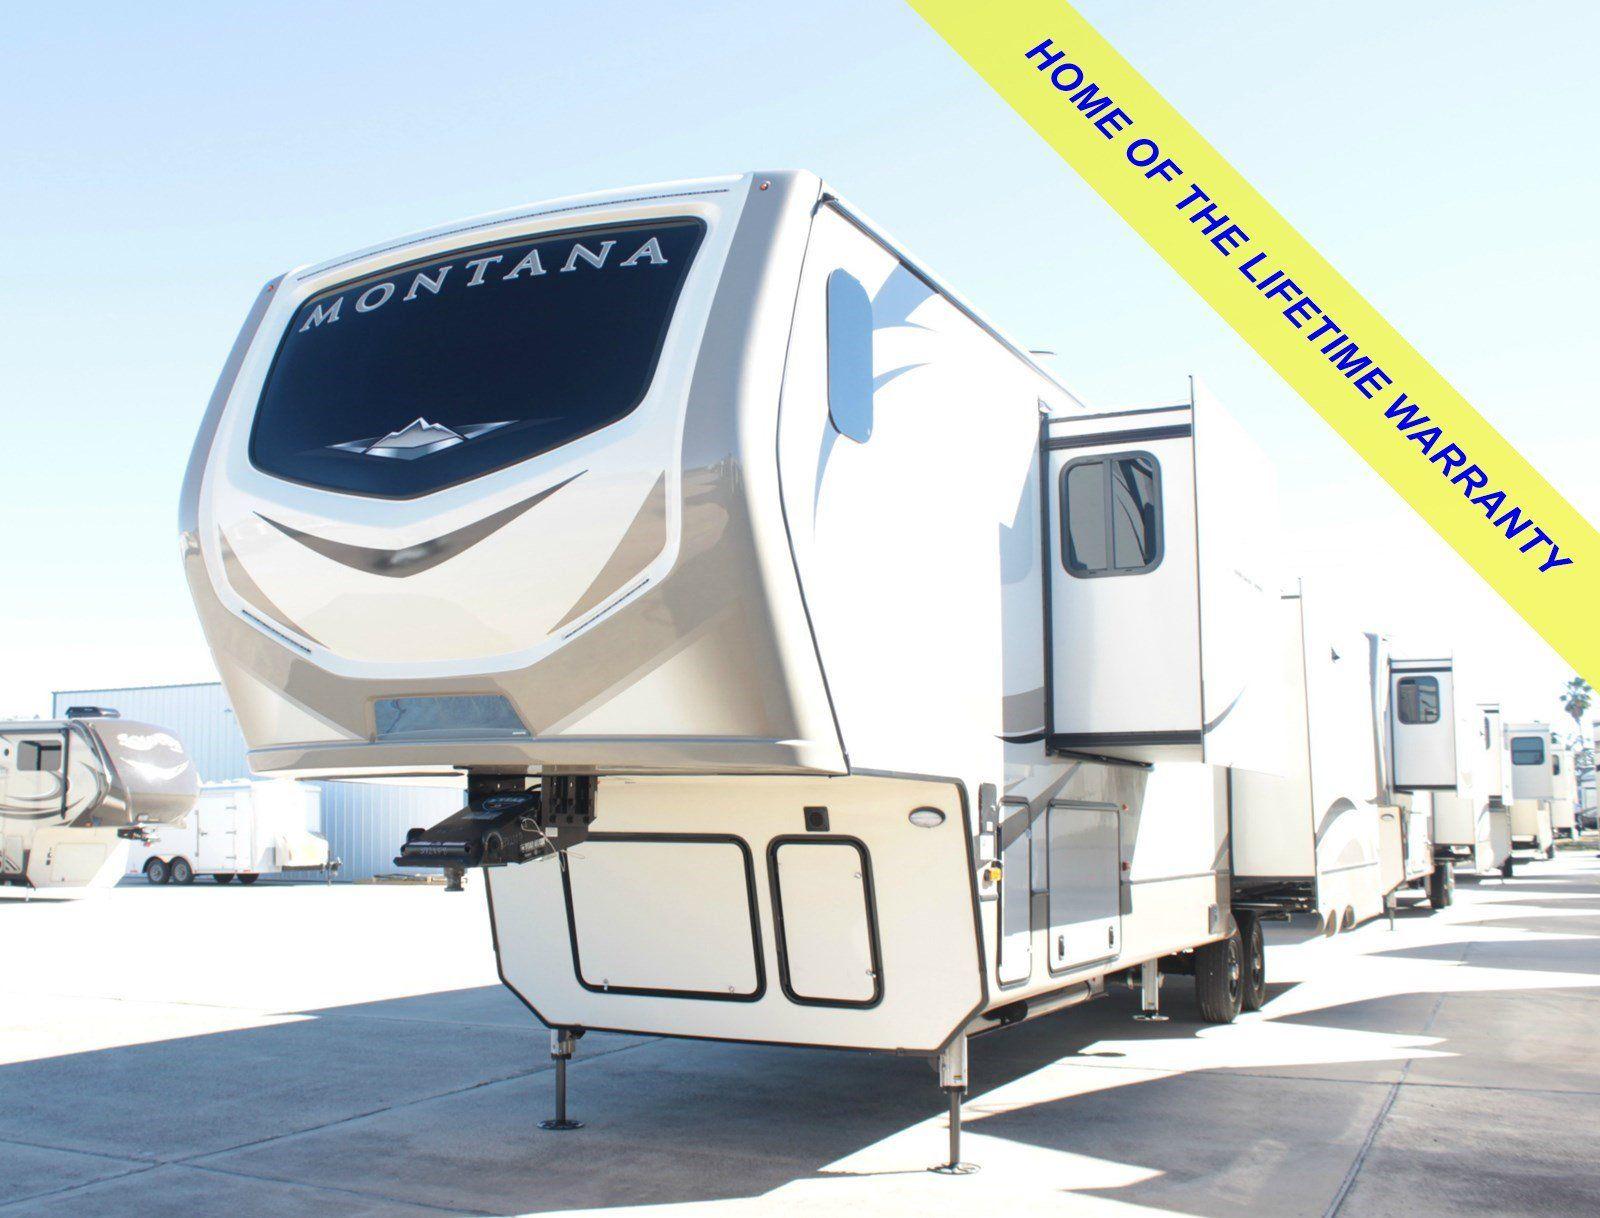 2019 Keystone Montana 3921FB Camper Clinic 5188